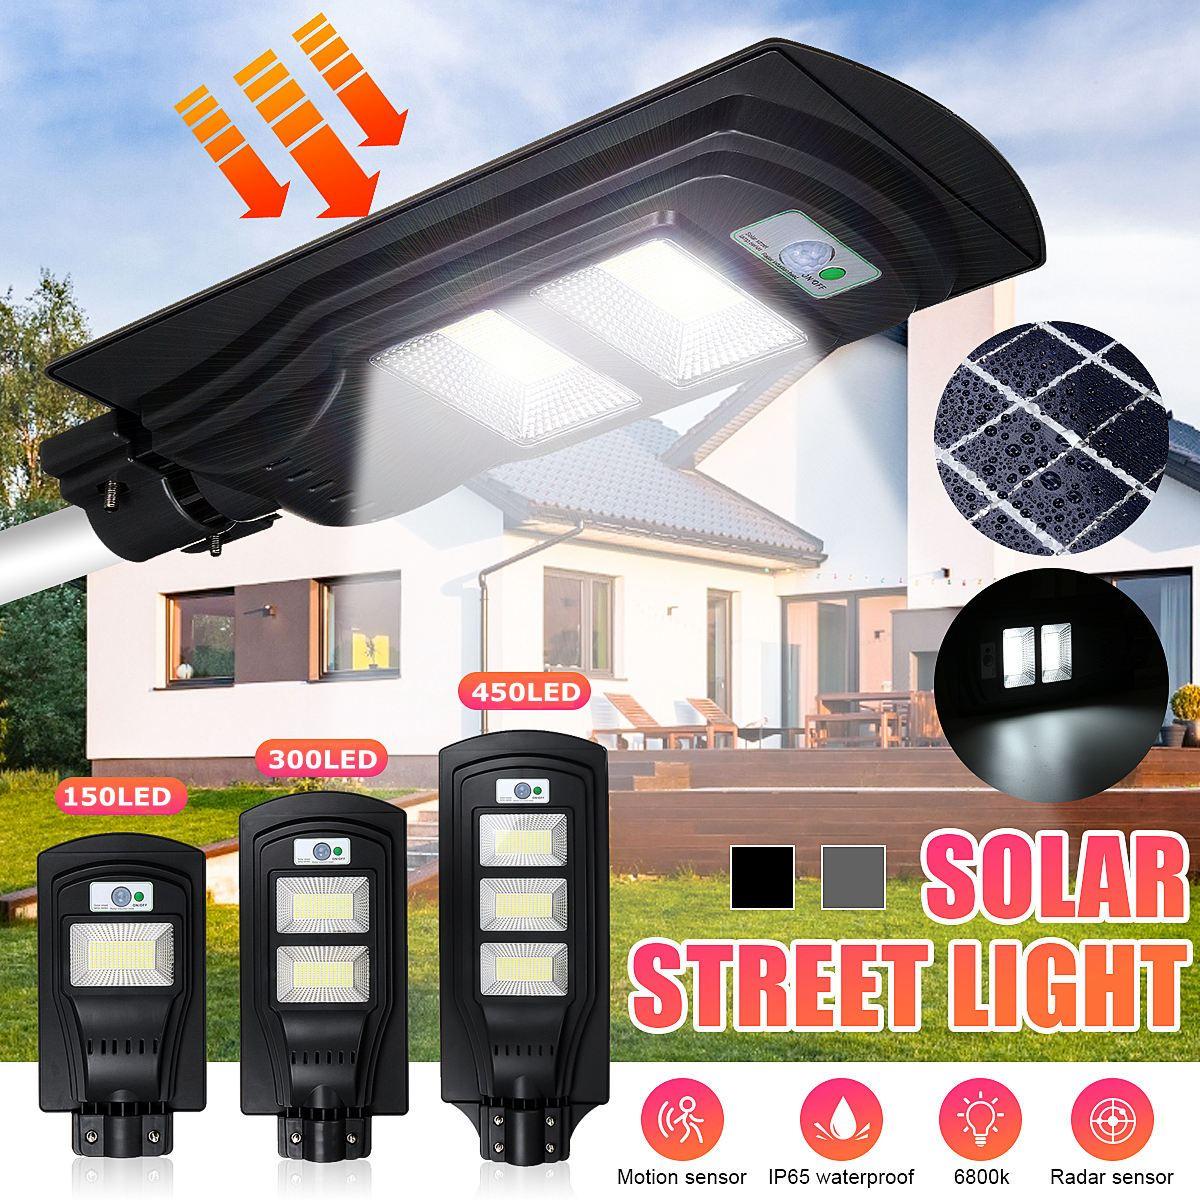 320W 640W 950W LED الشمسية ضوء الشارع في الهواء الطلق الإضاءة حديقة ساحة جدار الطريق موقف للسيارات الأمن مصباح IP67 للماء